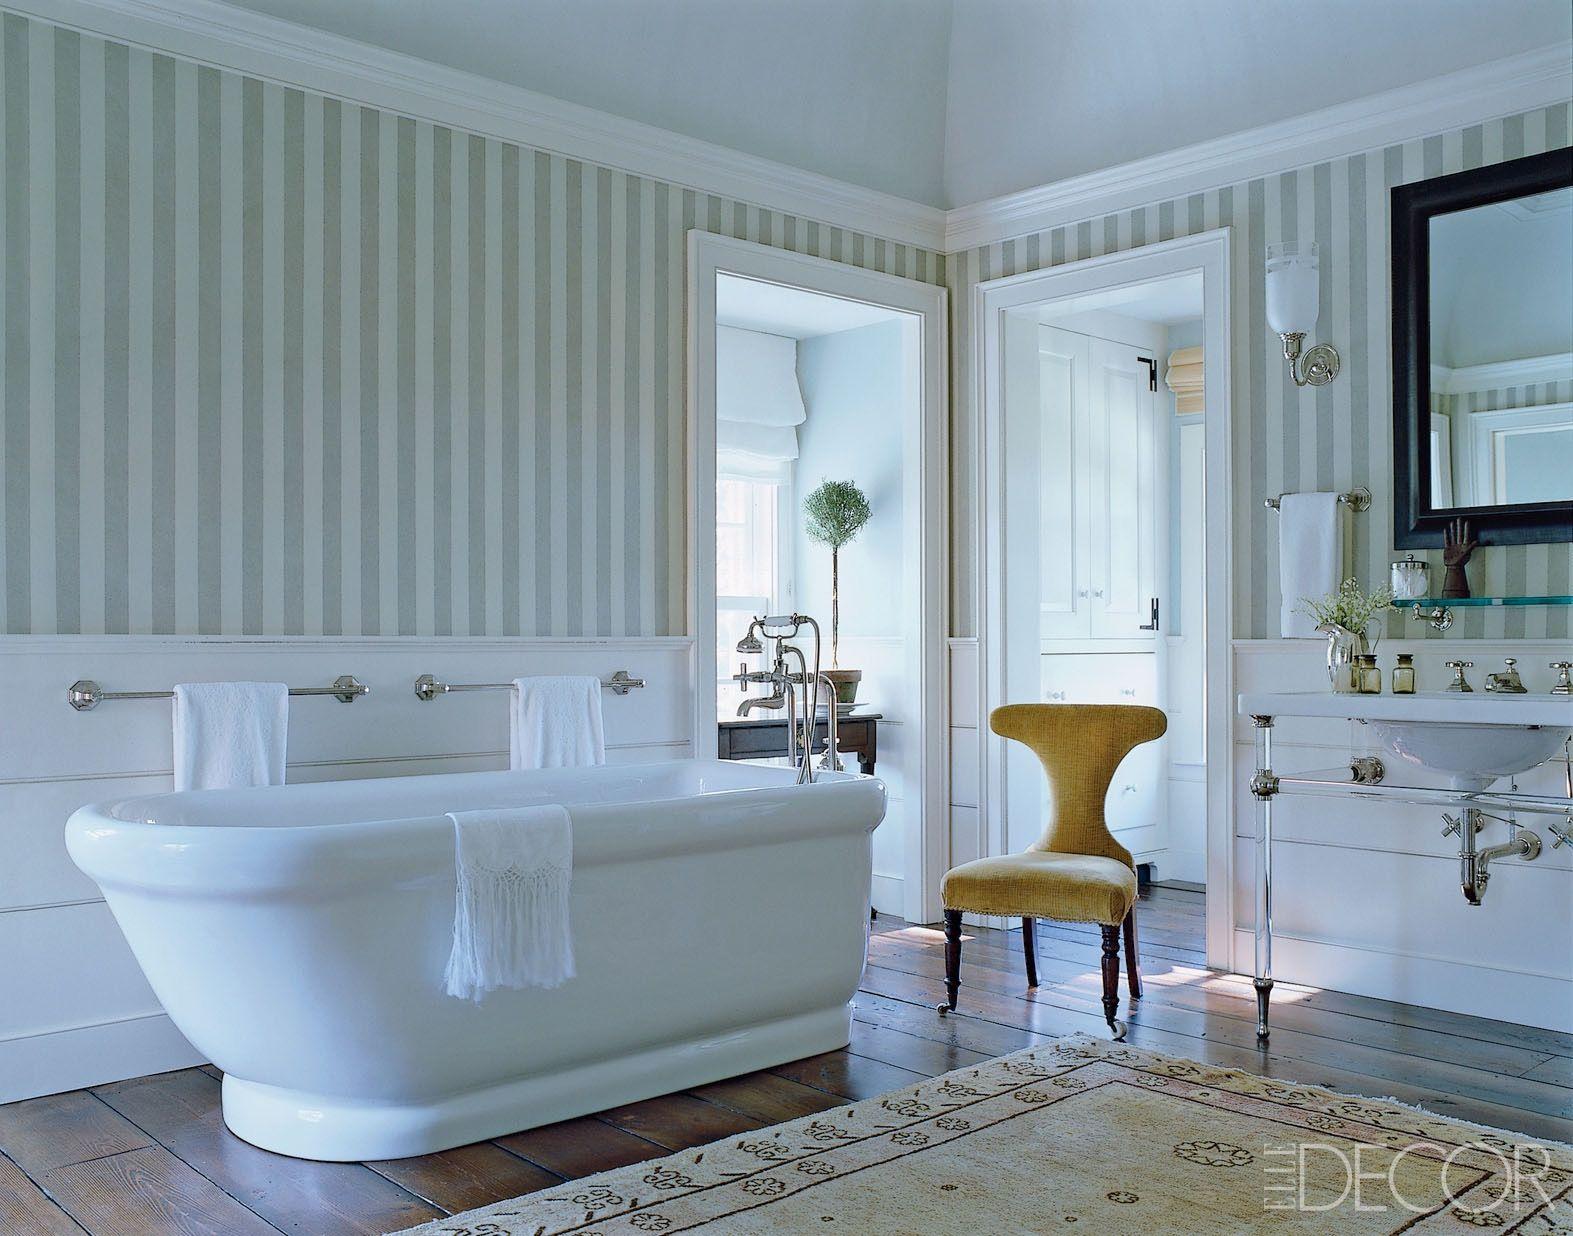 ideas for bathroom wall coverings | Training4Green.com | Interior ...